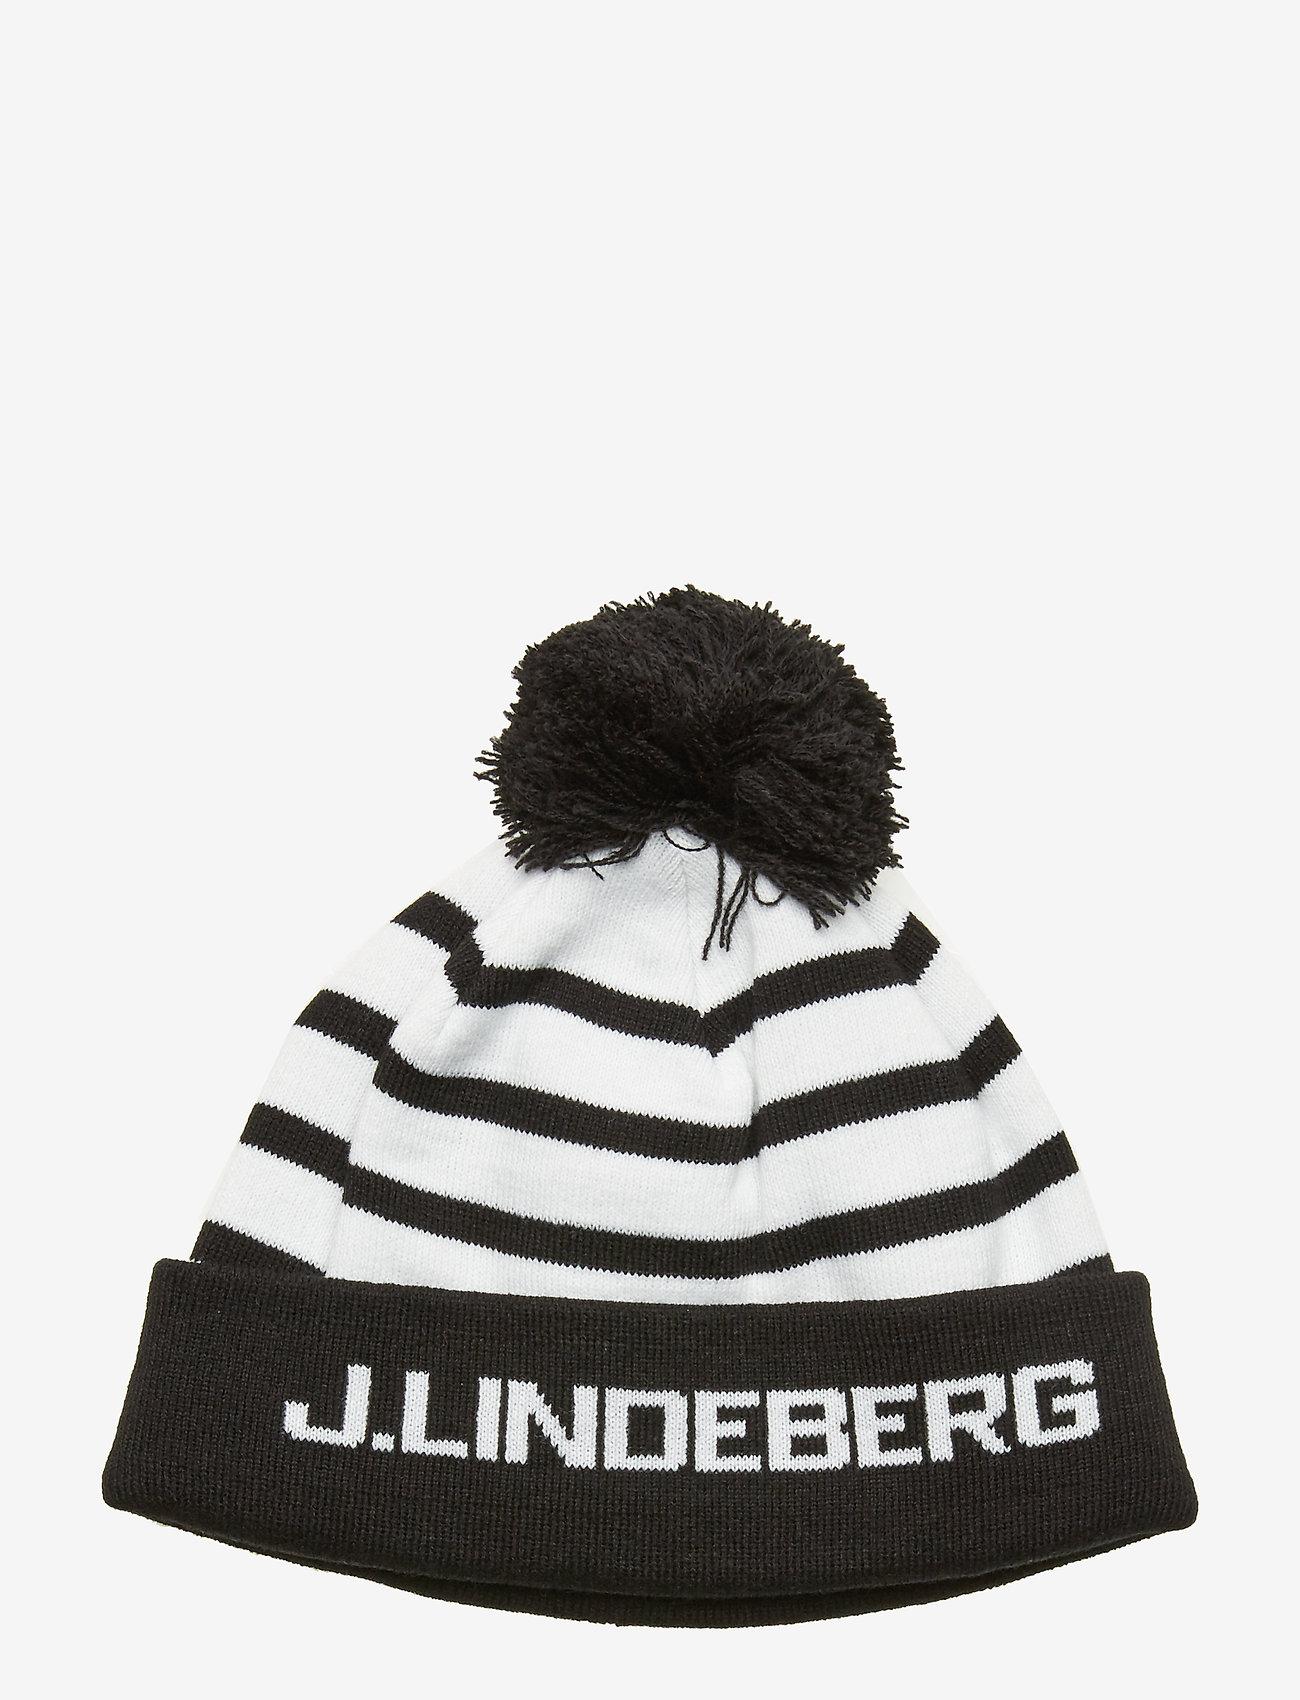 J. Lindeberg Ski - Stripe Ball Beanie-Acrylic - beanies - black - 0